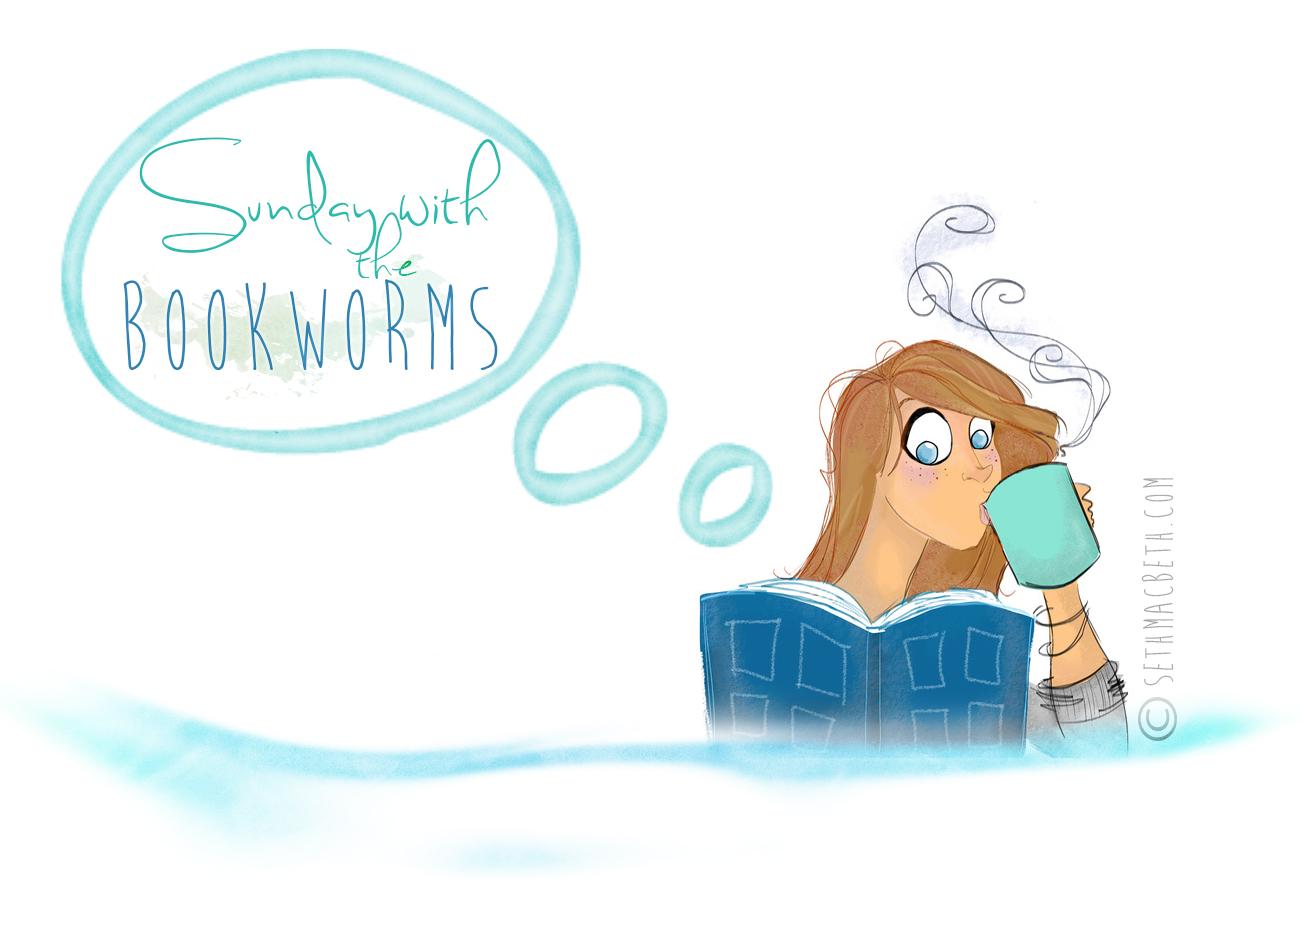 Sundaywiththebookworms2